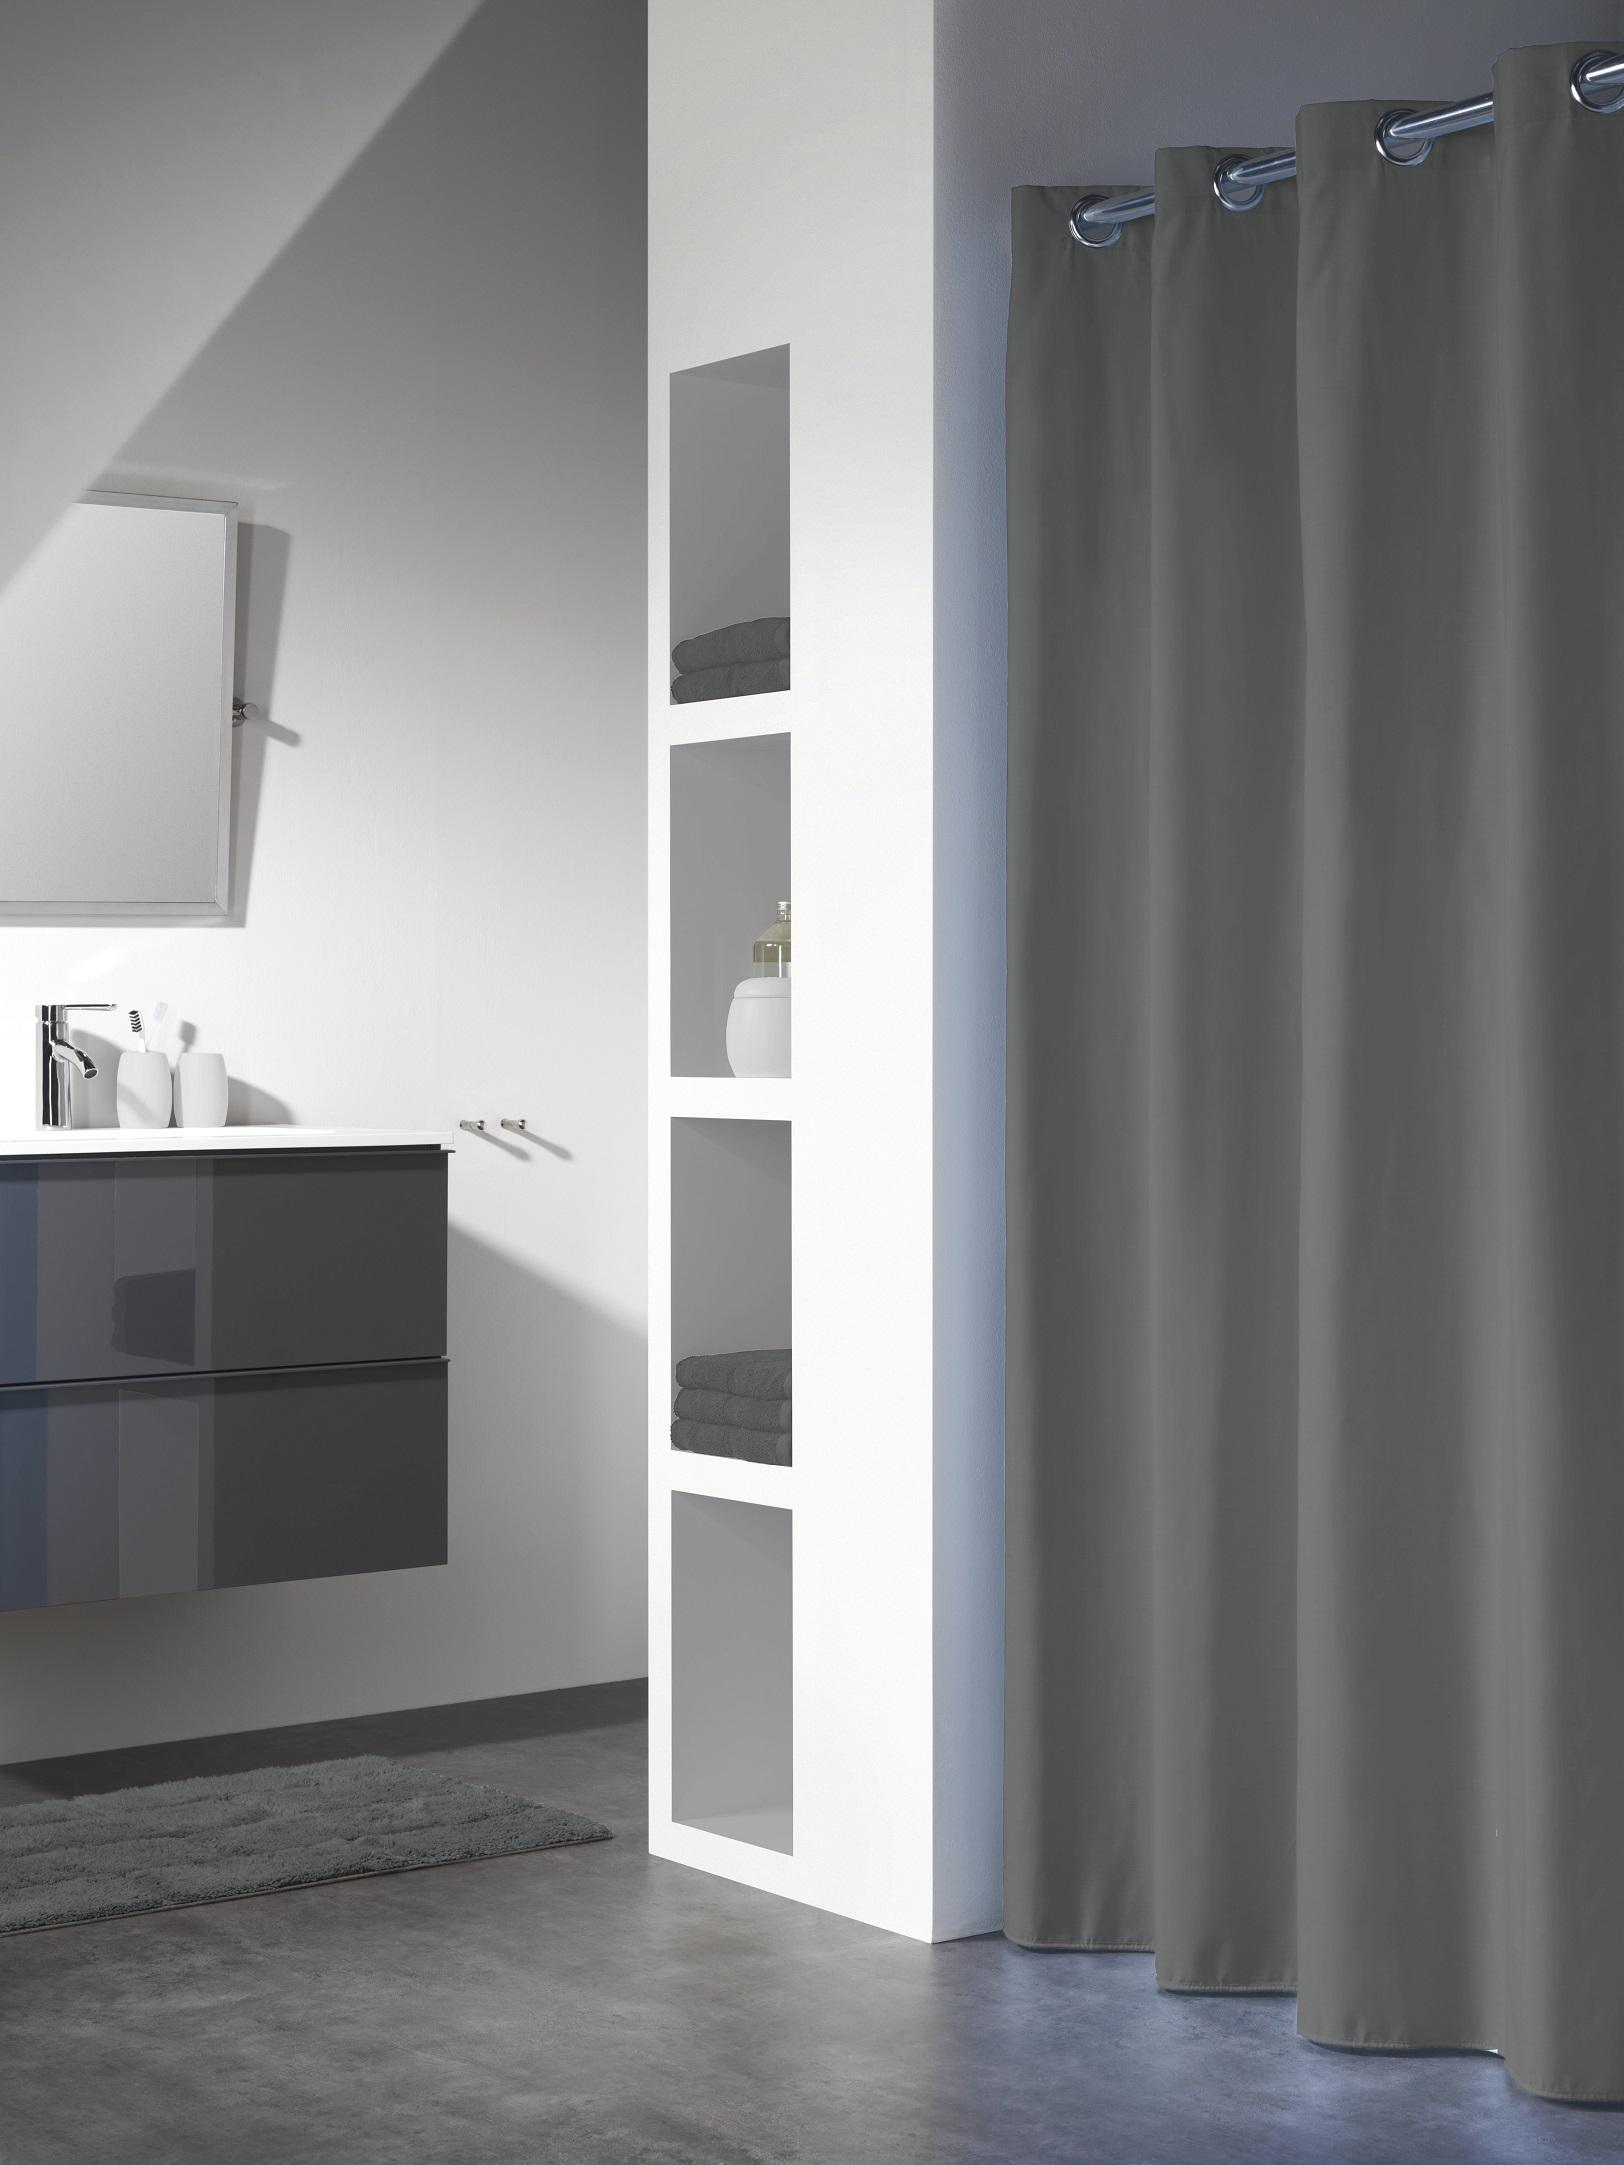 Sealskin douchegordijn Coloris polyester/katoen grijs 180x200 cm